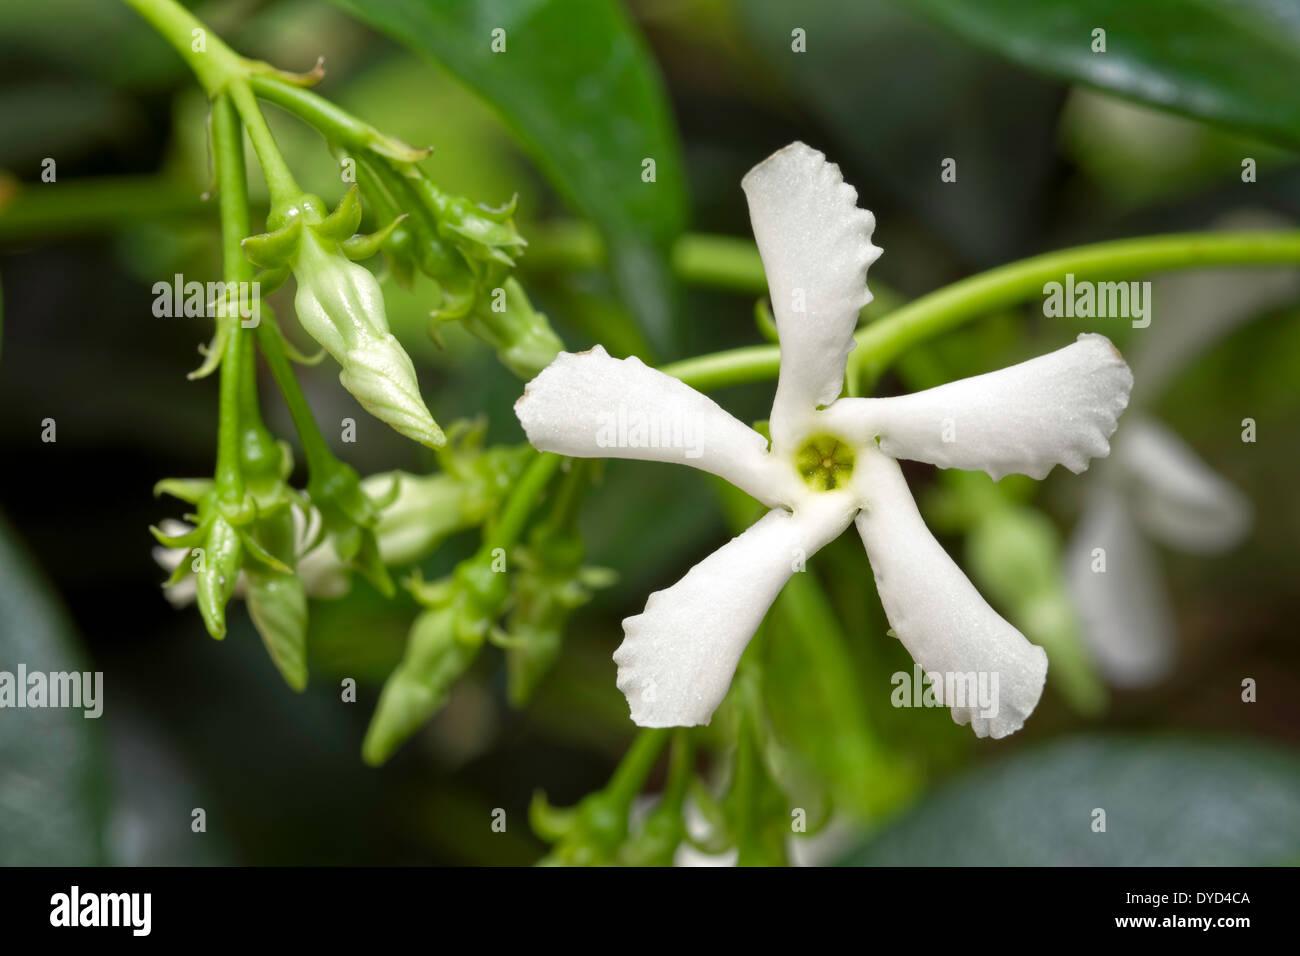 Jasmine Flower Flowers Plant Stock Photos Jasmine Flower Flowers